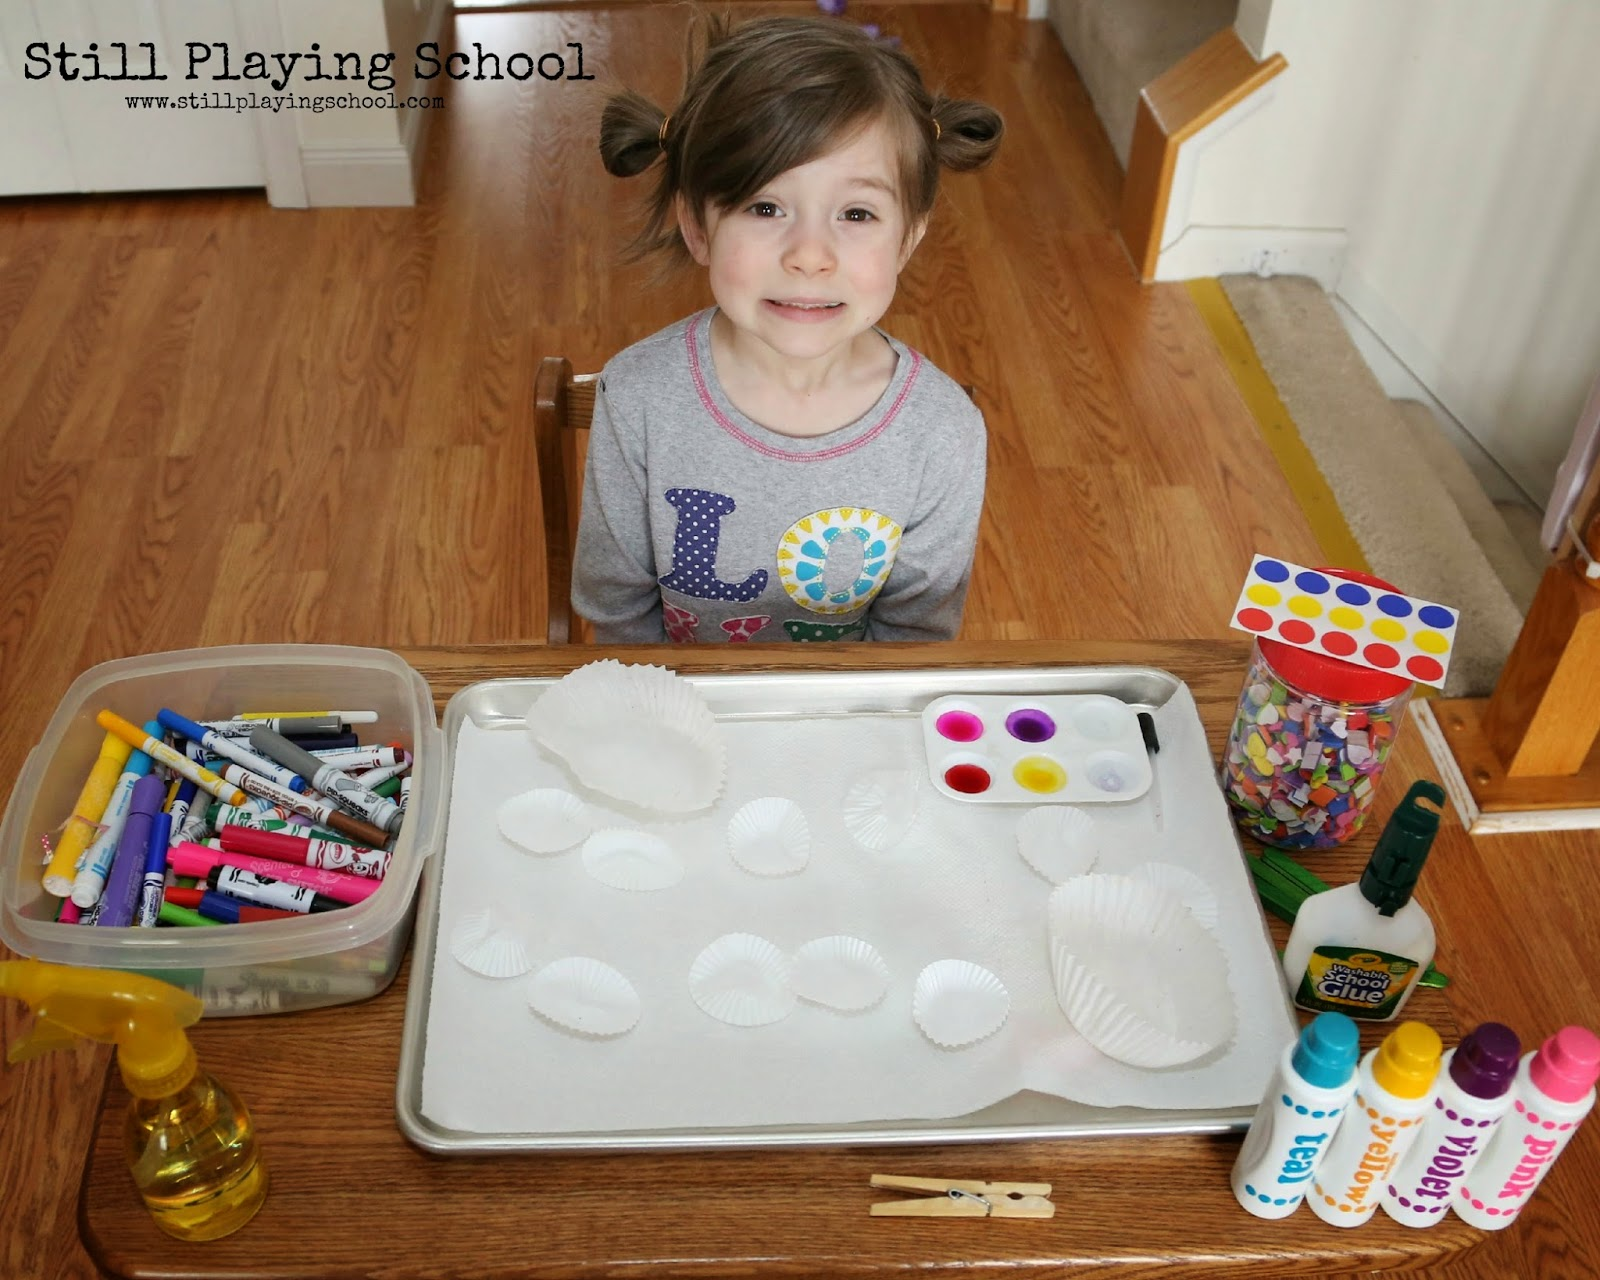 cupcake liner flower craft fine motor art for kids preschool art table t69 art